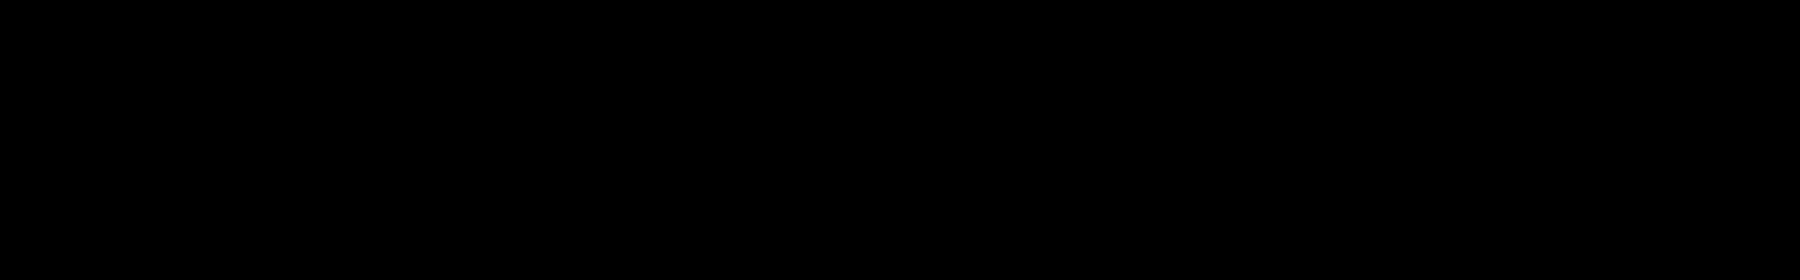 Biologic audio waveform